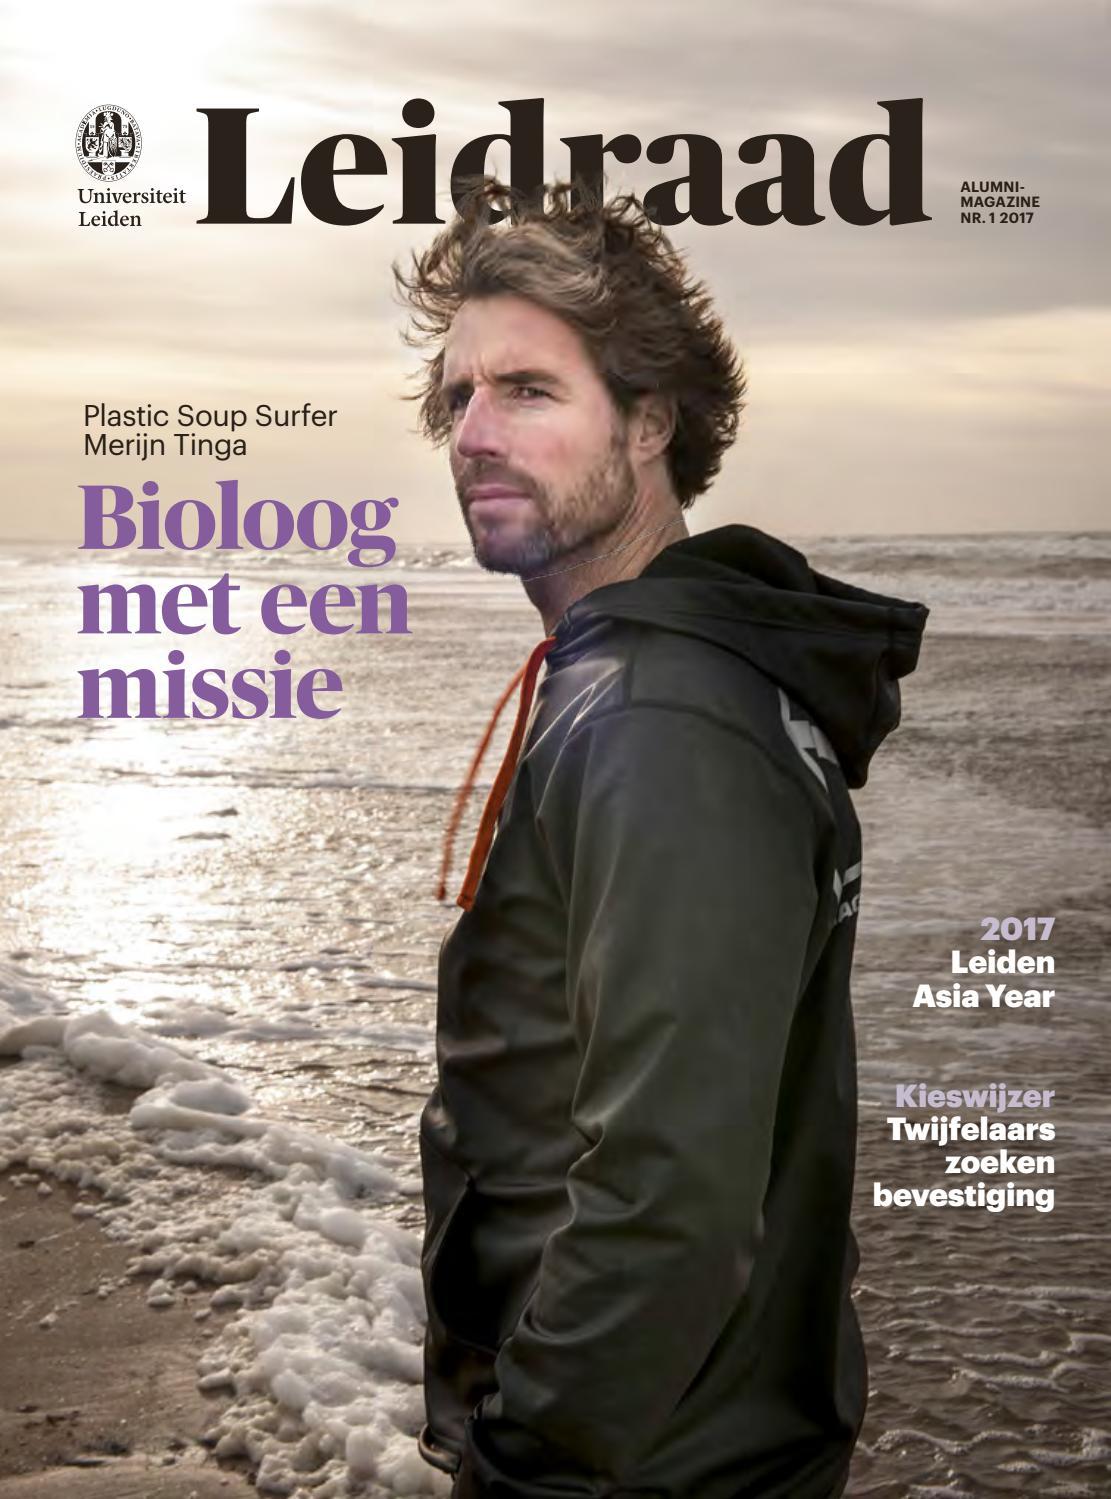 Leidraad zomer 2015 by Universiteit Leiden - issuu